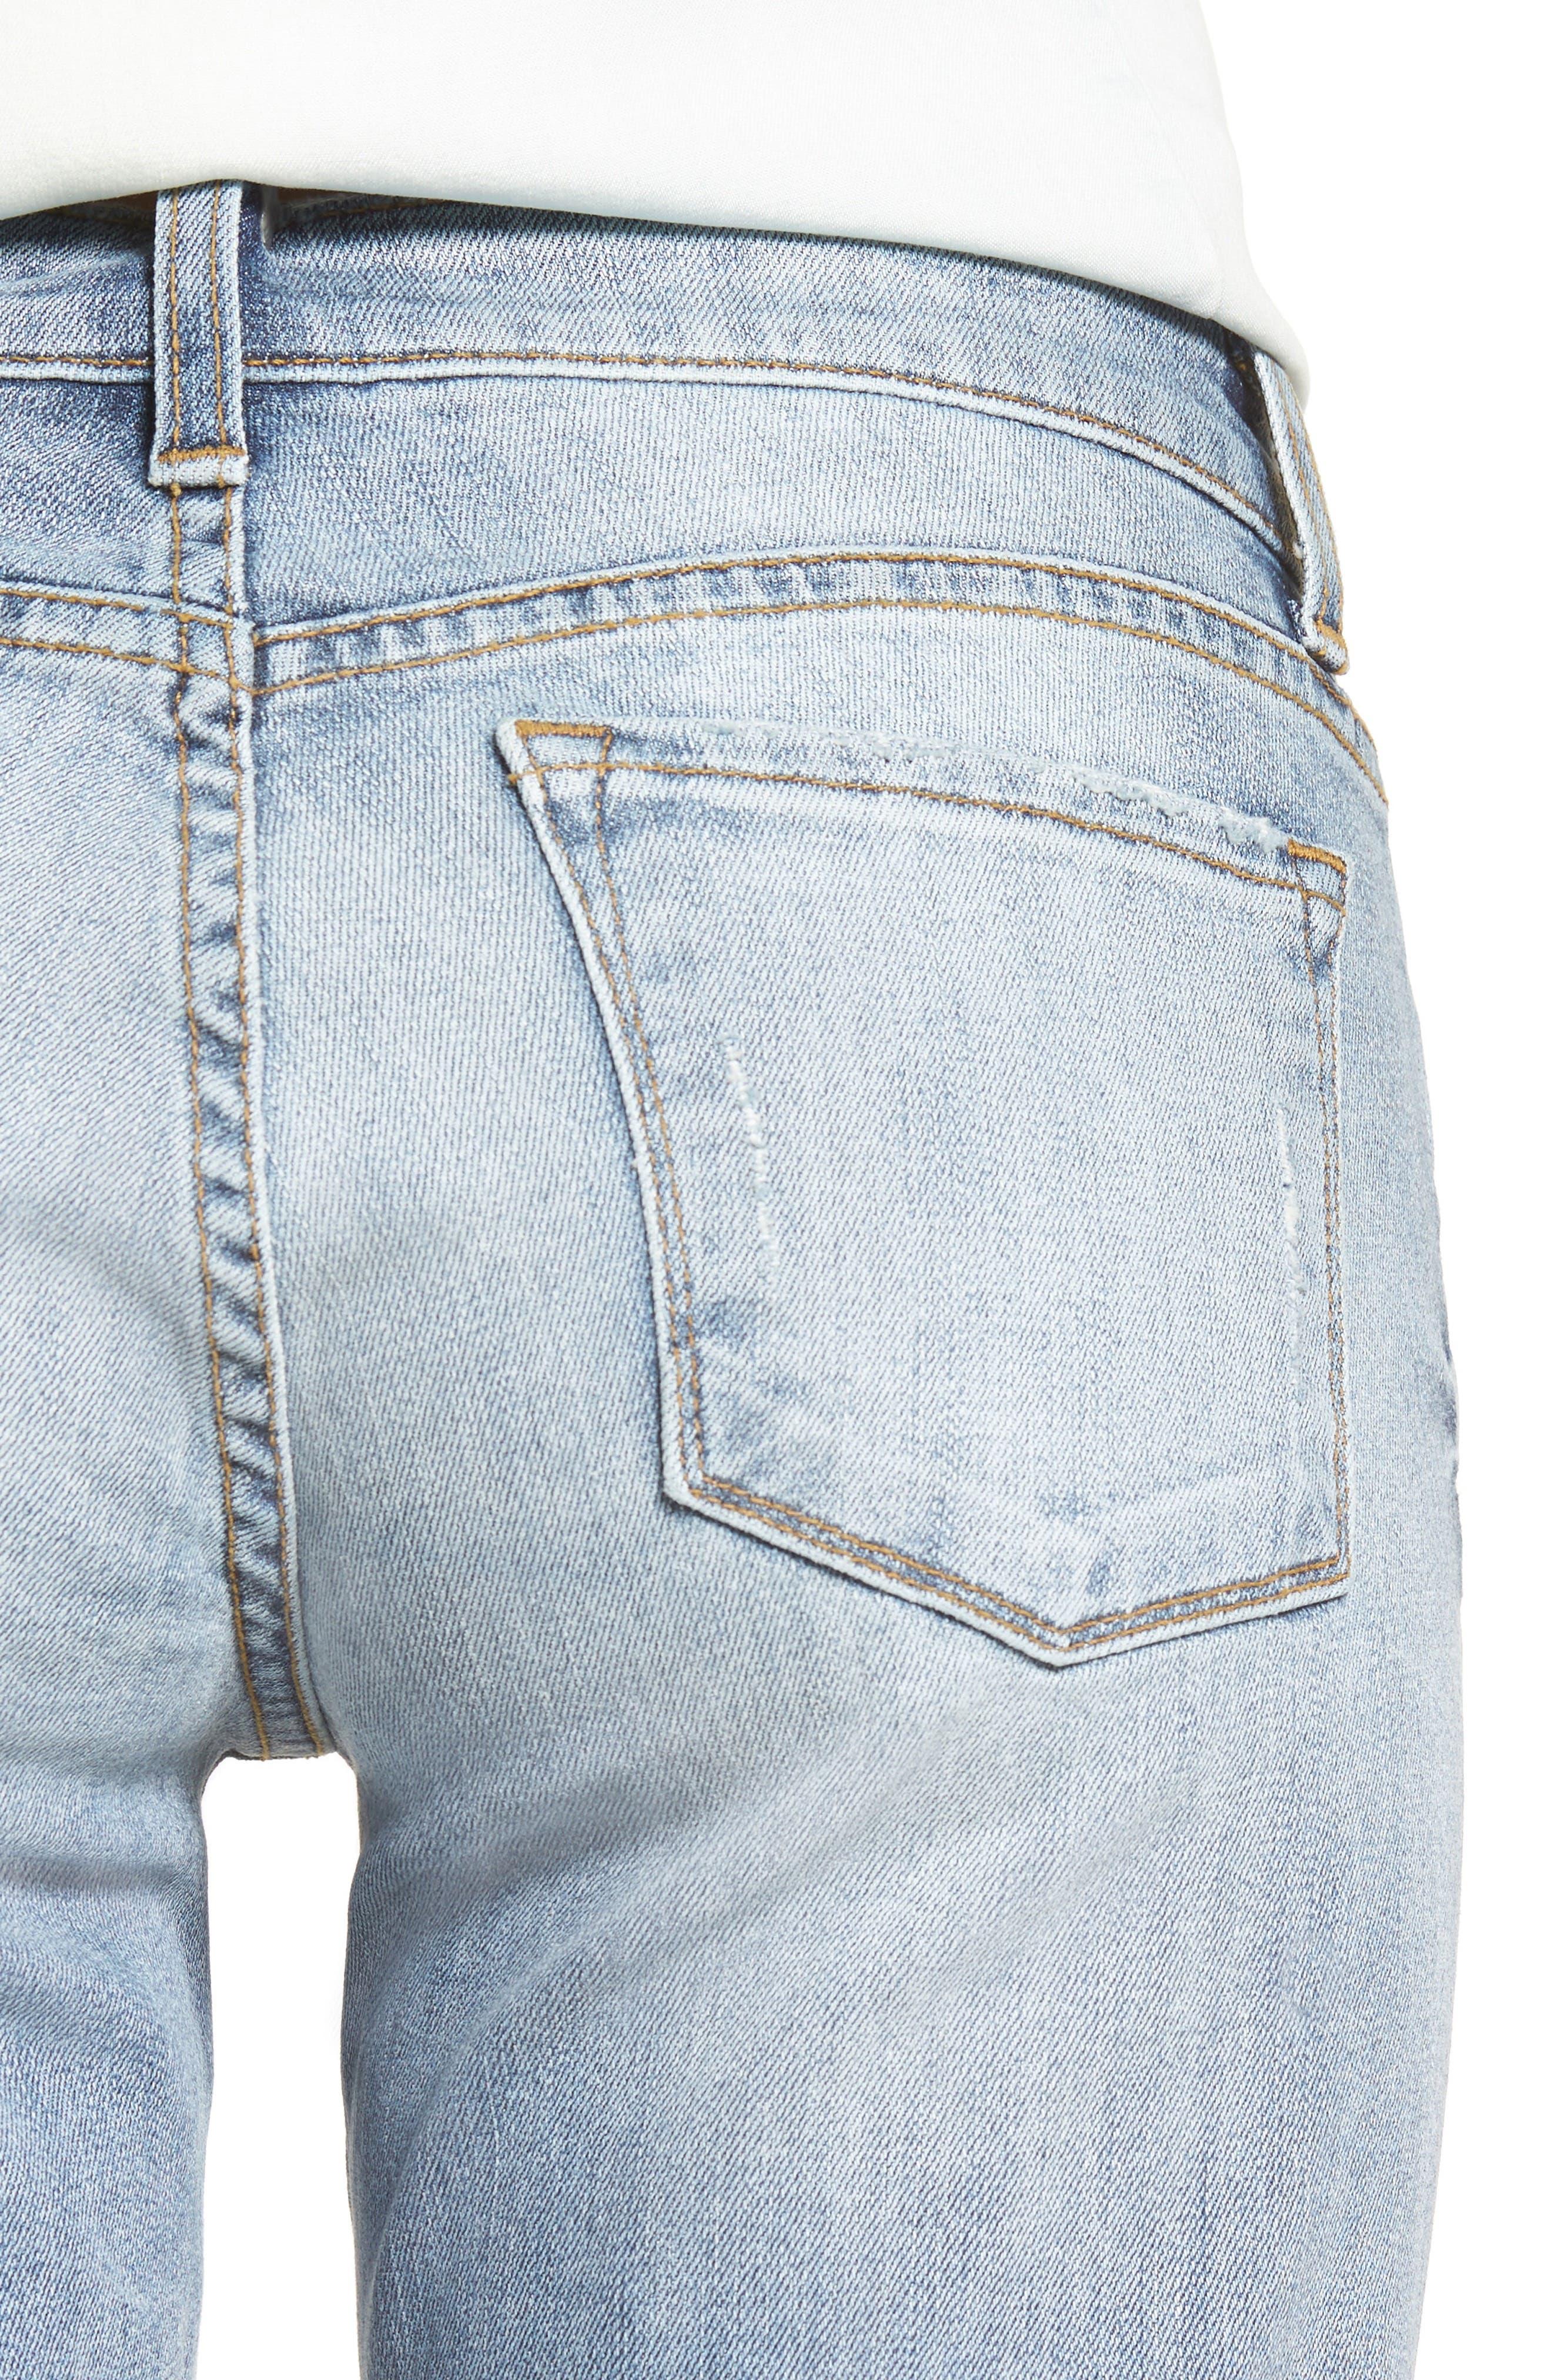 Catherine Distressed Boyfriend Jeans,                             Alternate thumbnail 4, color,                             421